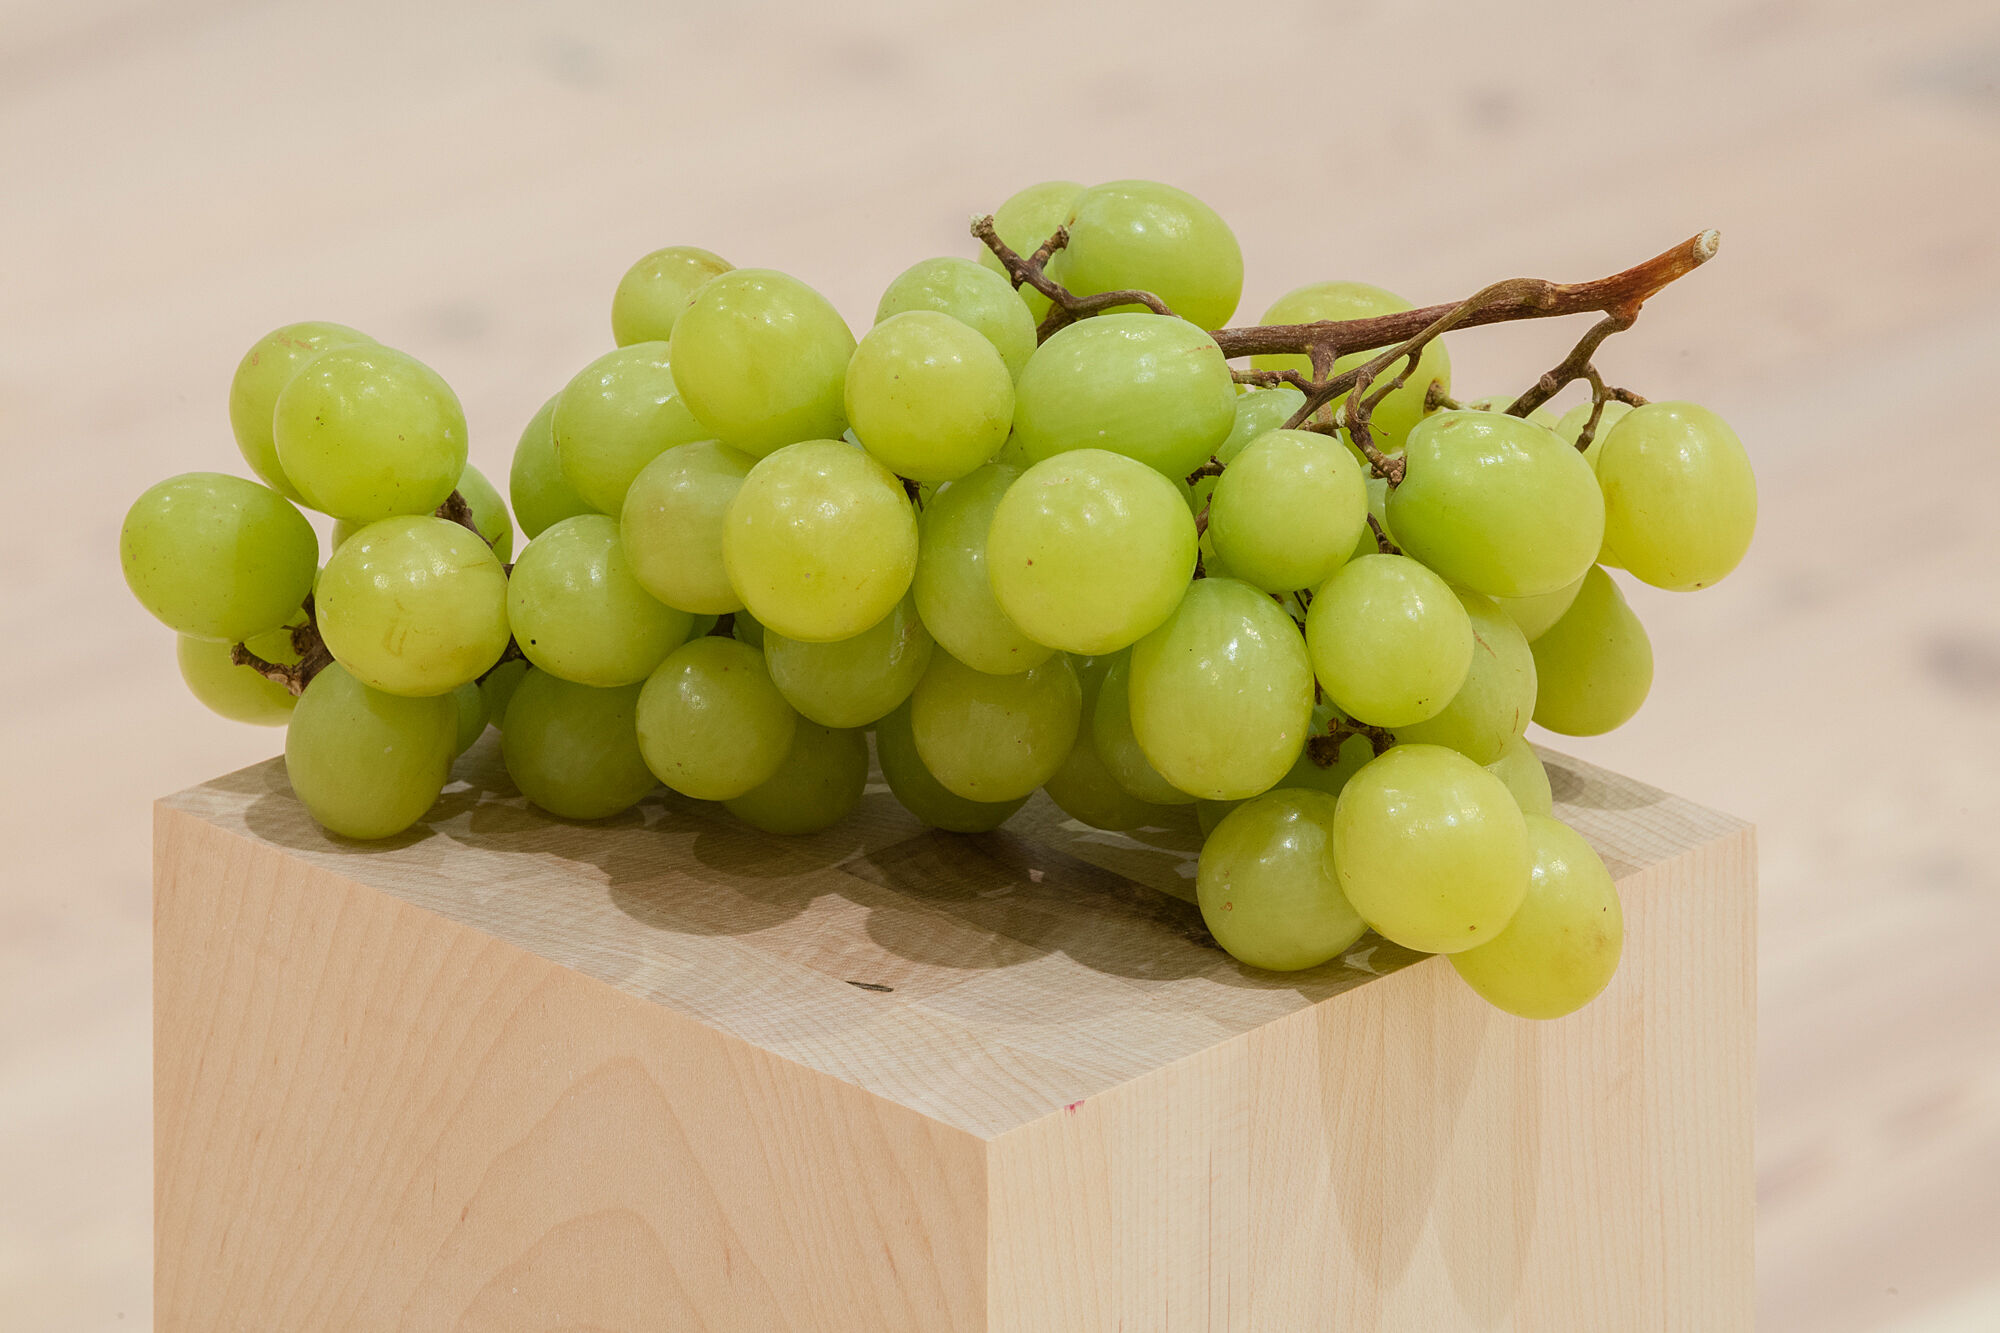 A photo of grapes on a plinth.